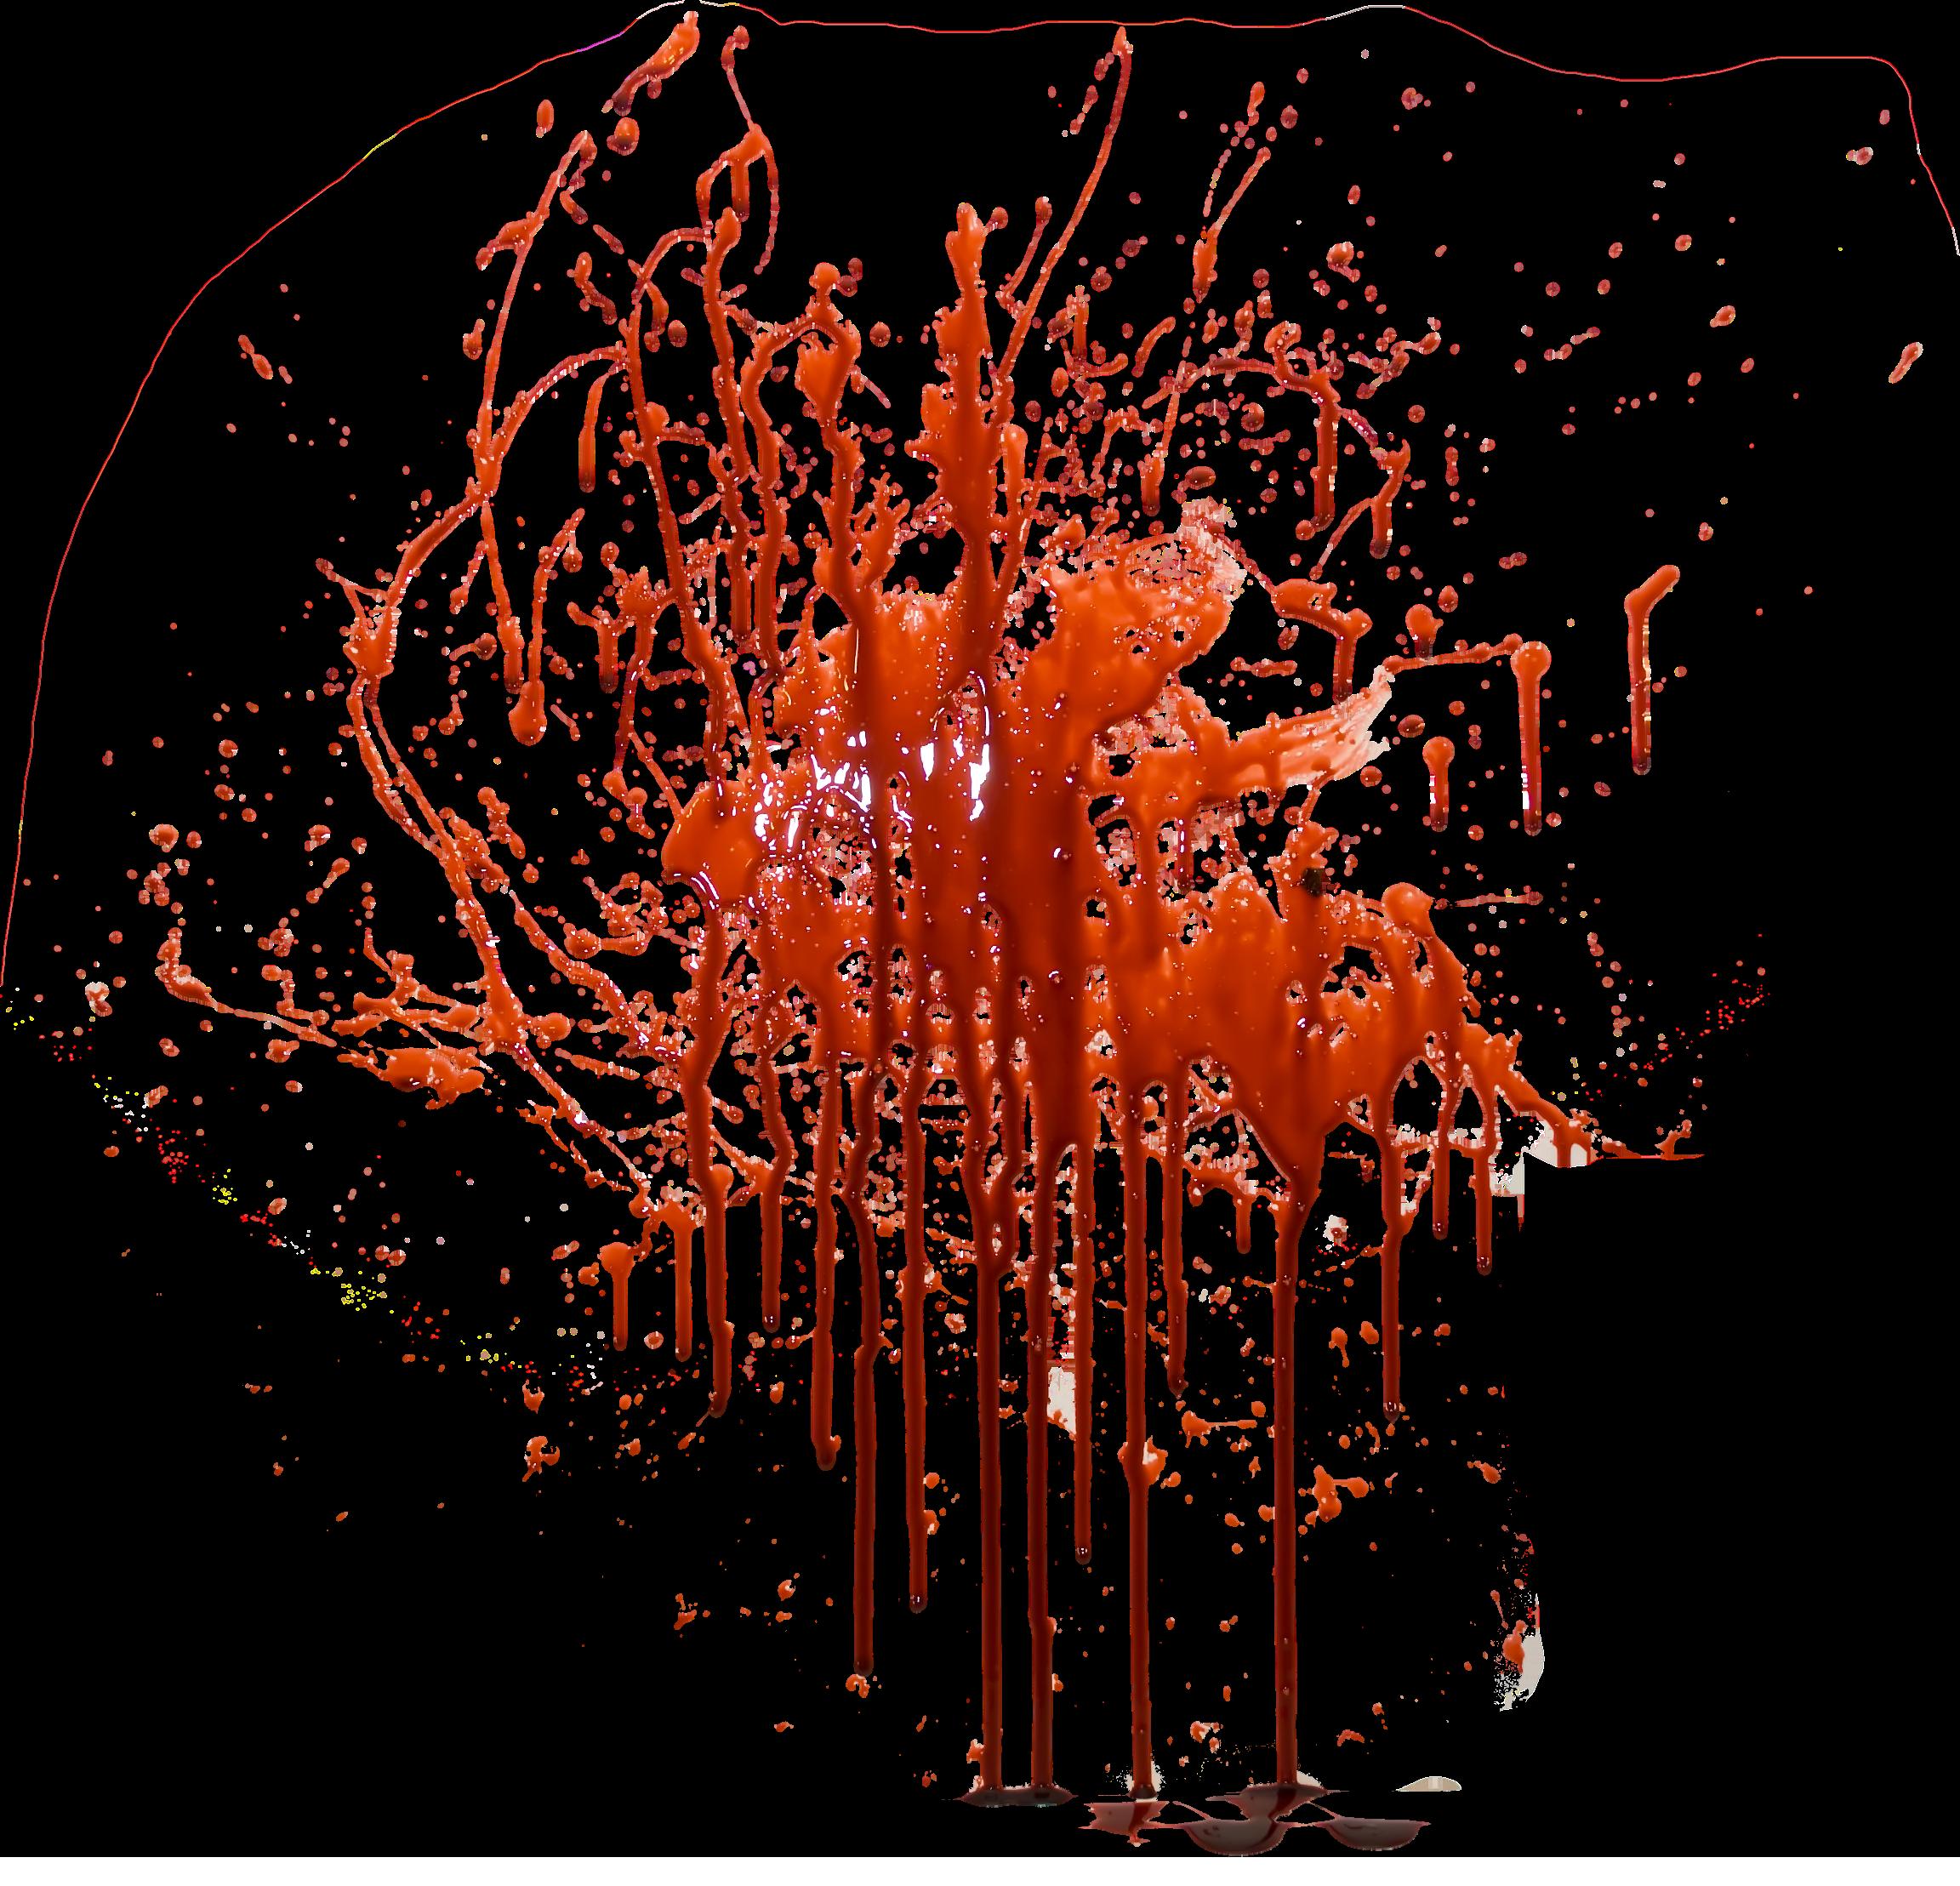 Blood spray png. Images free download splashes